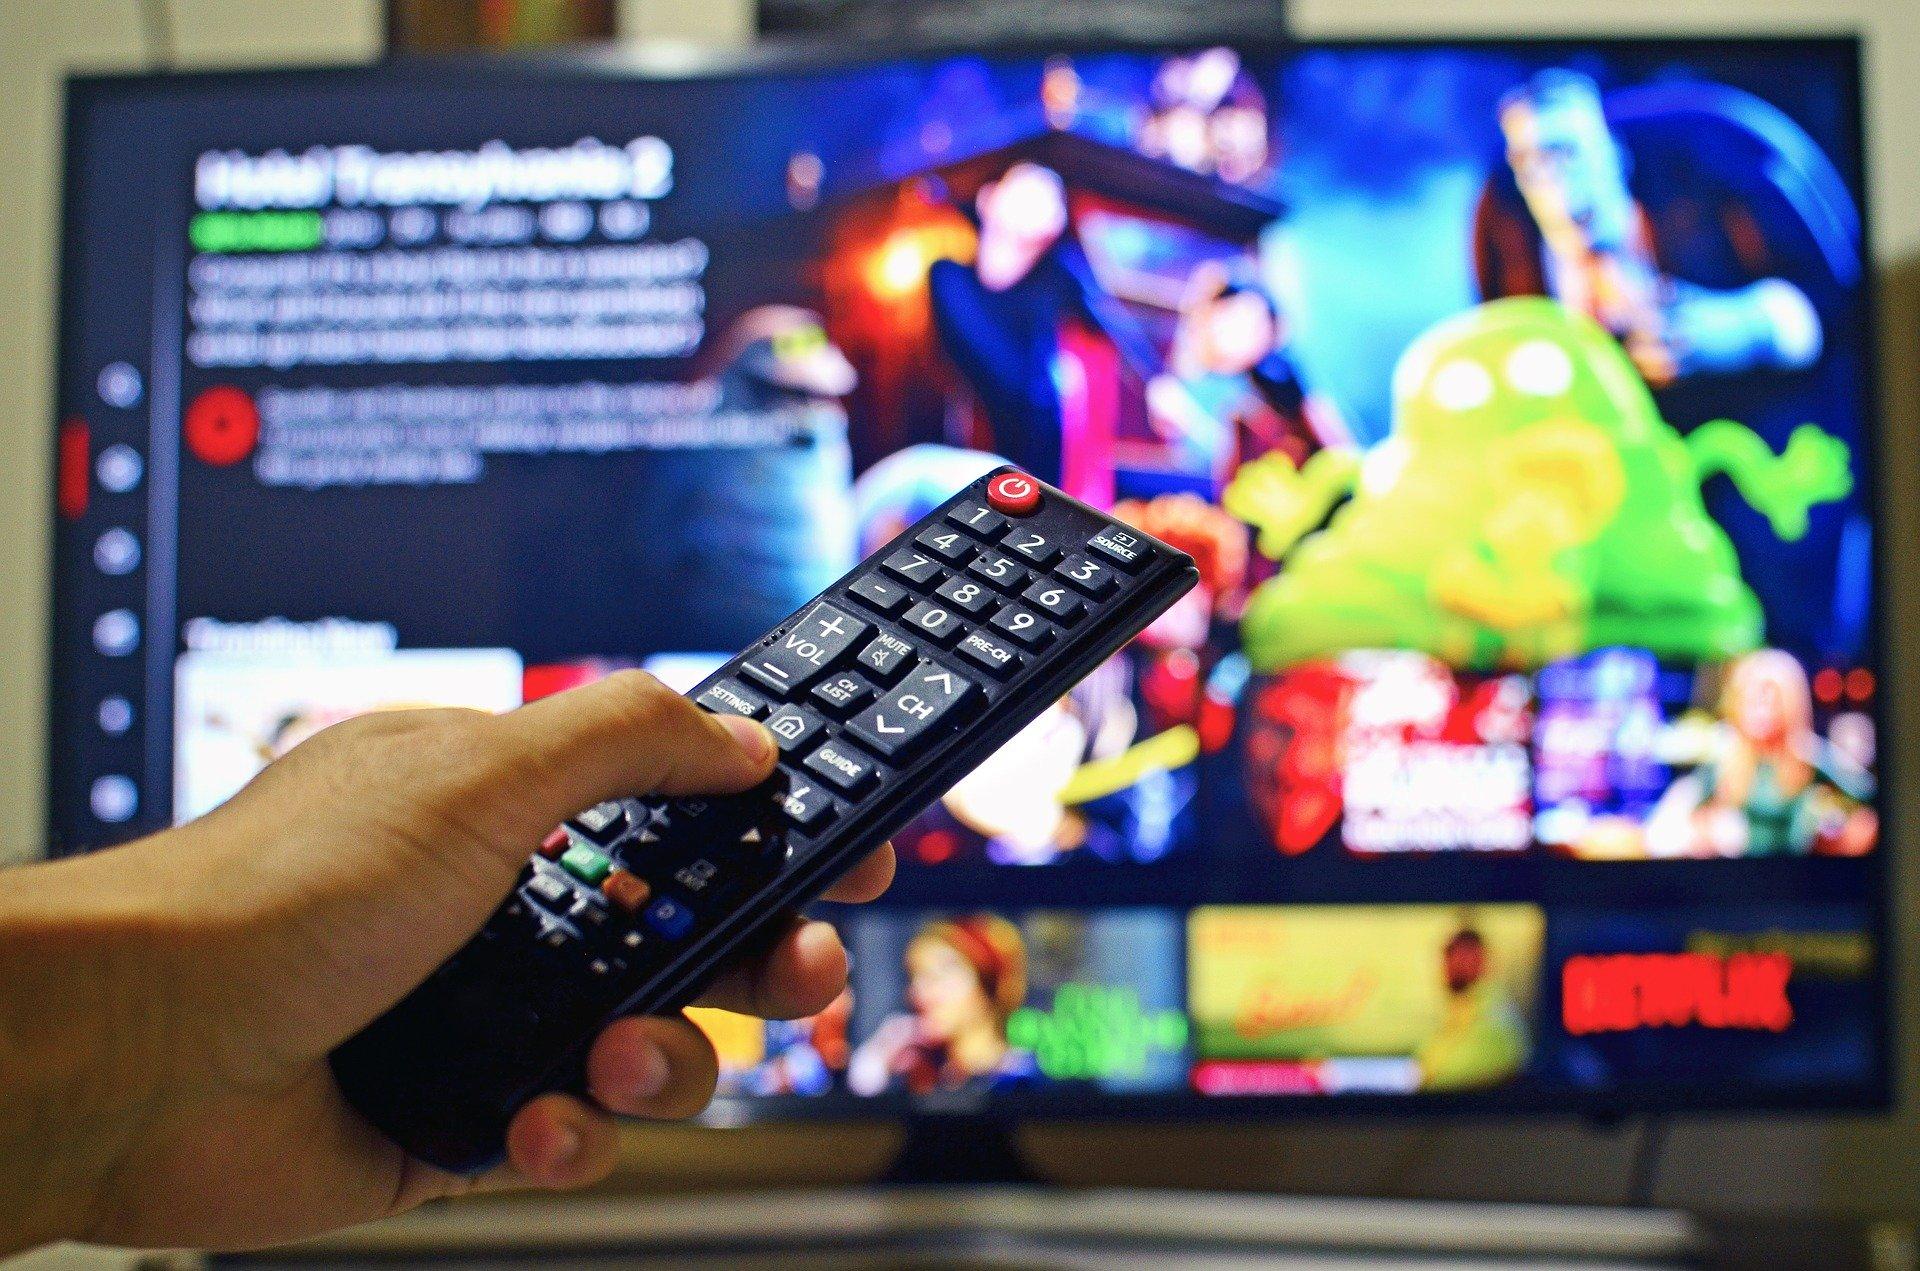 Qu'est-ce qu'un média streamer?